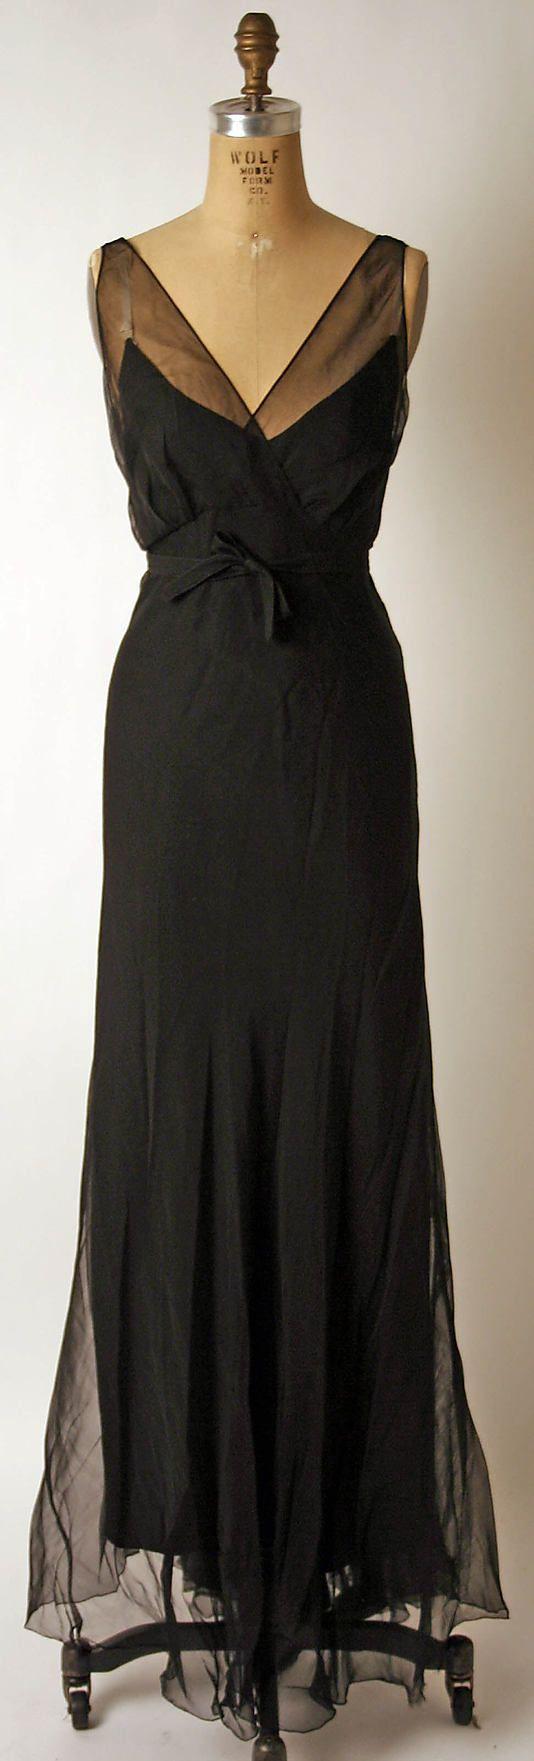 Black dress vintage - Fashion Evening 3 Timeless Dress Nettie Rosenstein 1930 S